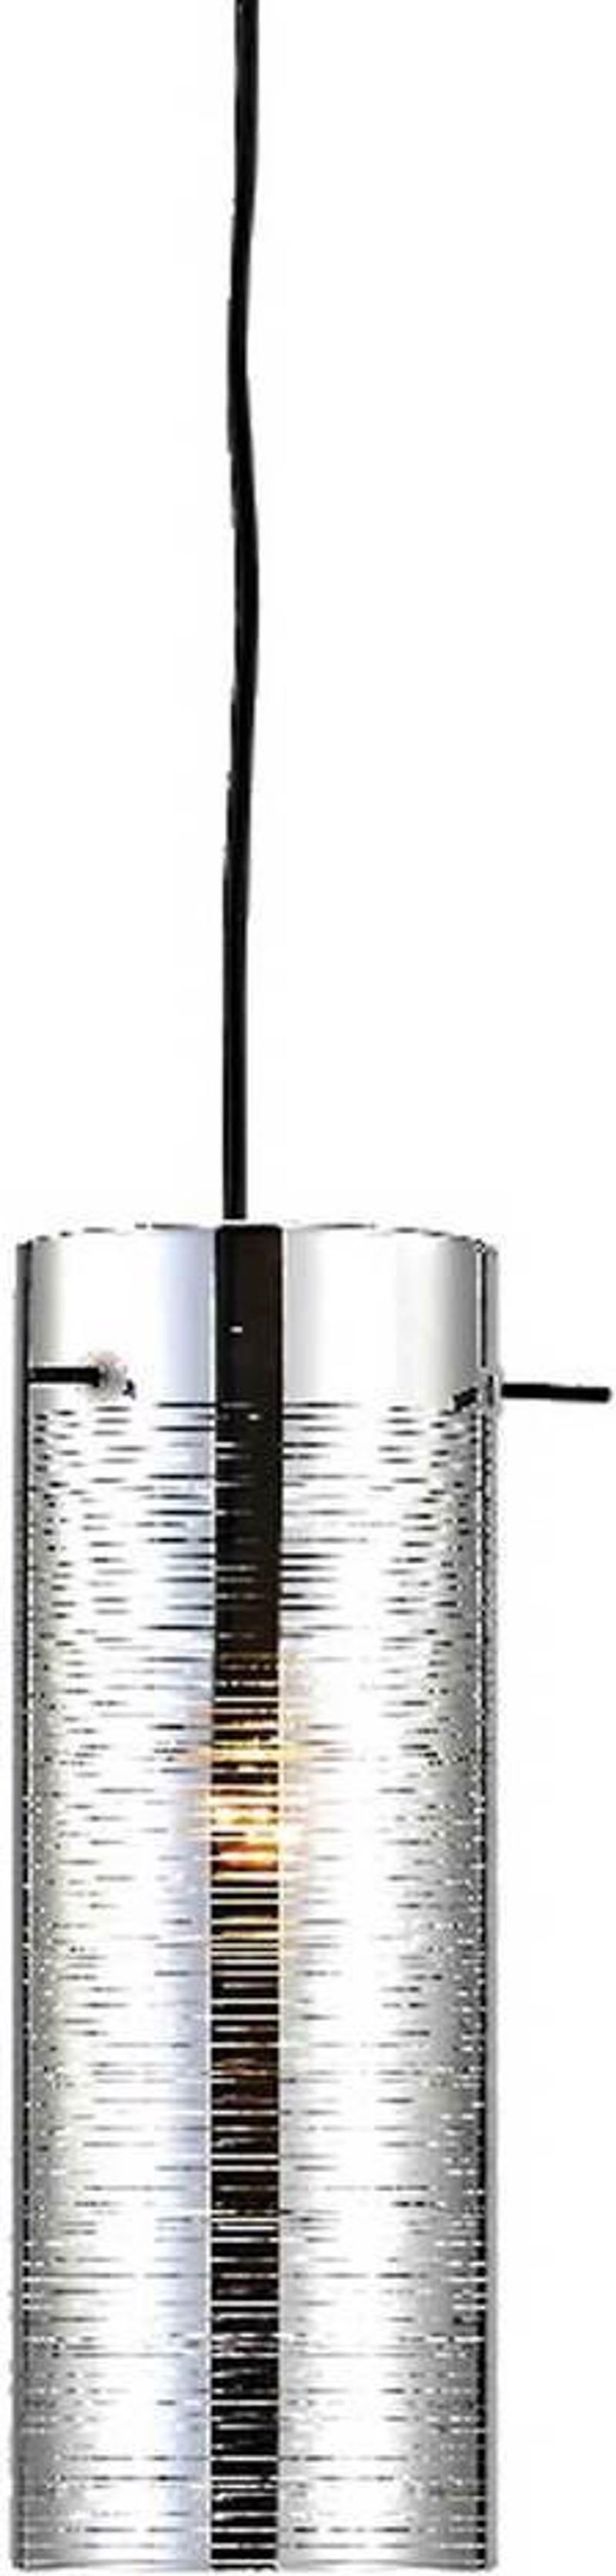 ACA Φωτιστικό Οροφής Μεταλλικό/Γυάλινο 'Vertigo' Χρώμιο Ε27 10Χ120cm DLA12591CH